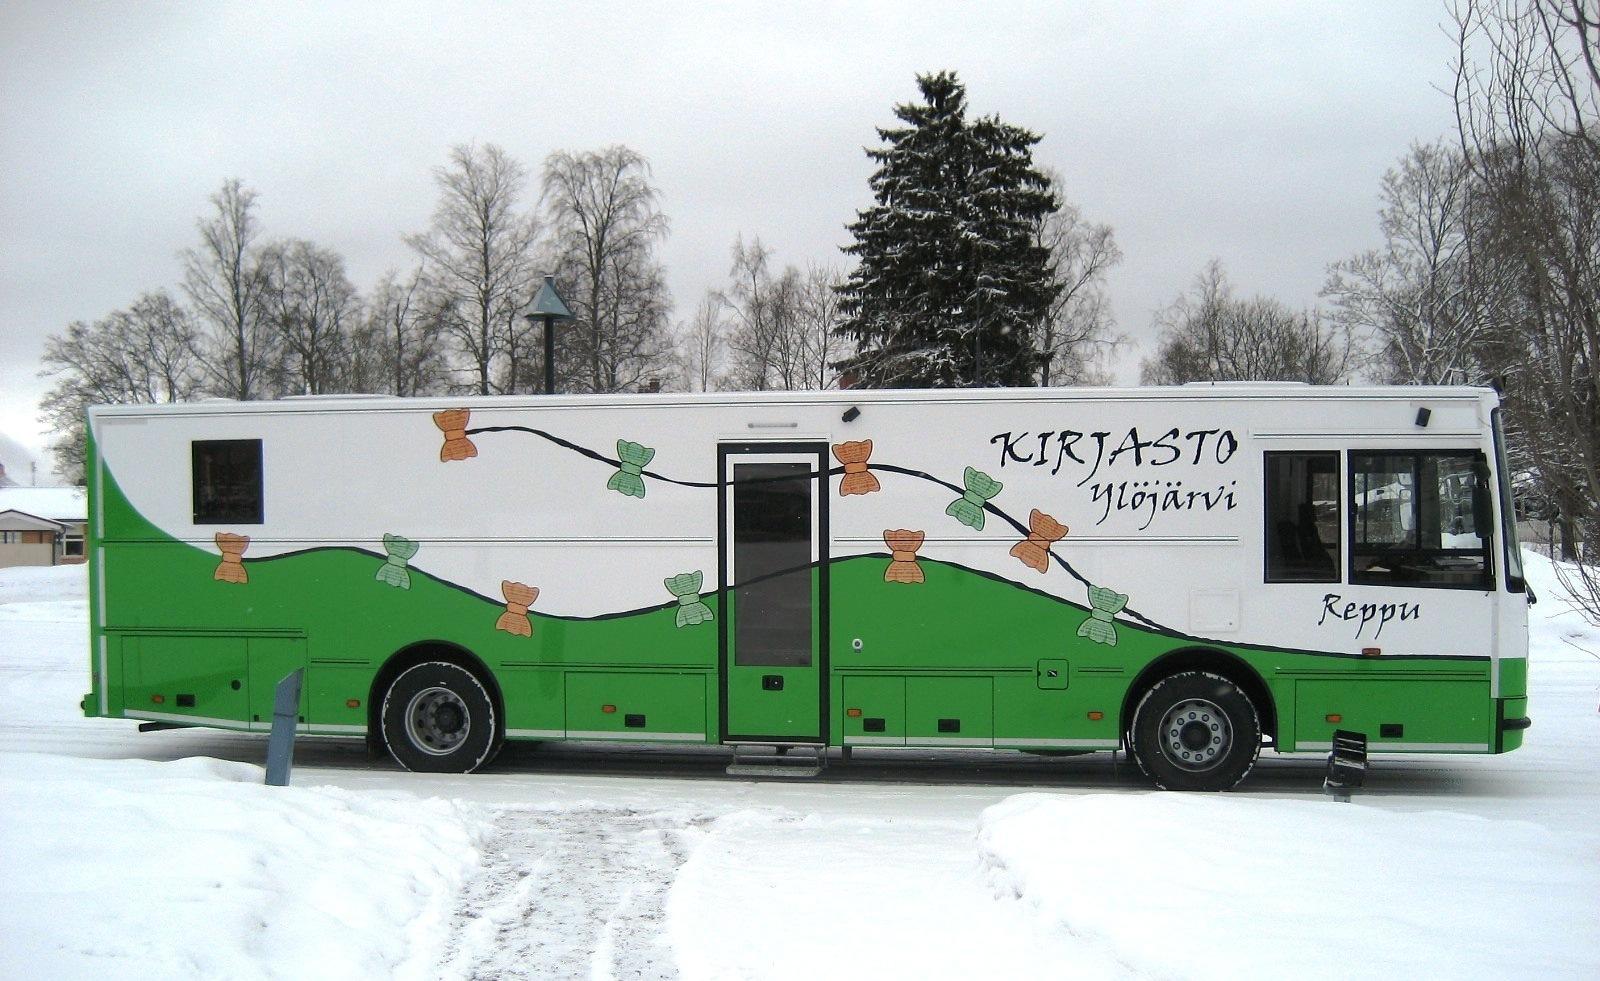 Kirjastoauto Reppu (Ylöjärvi)